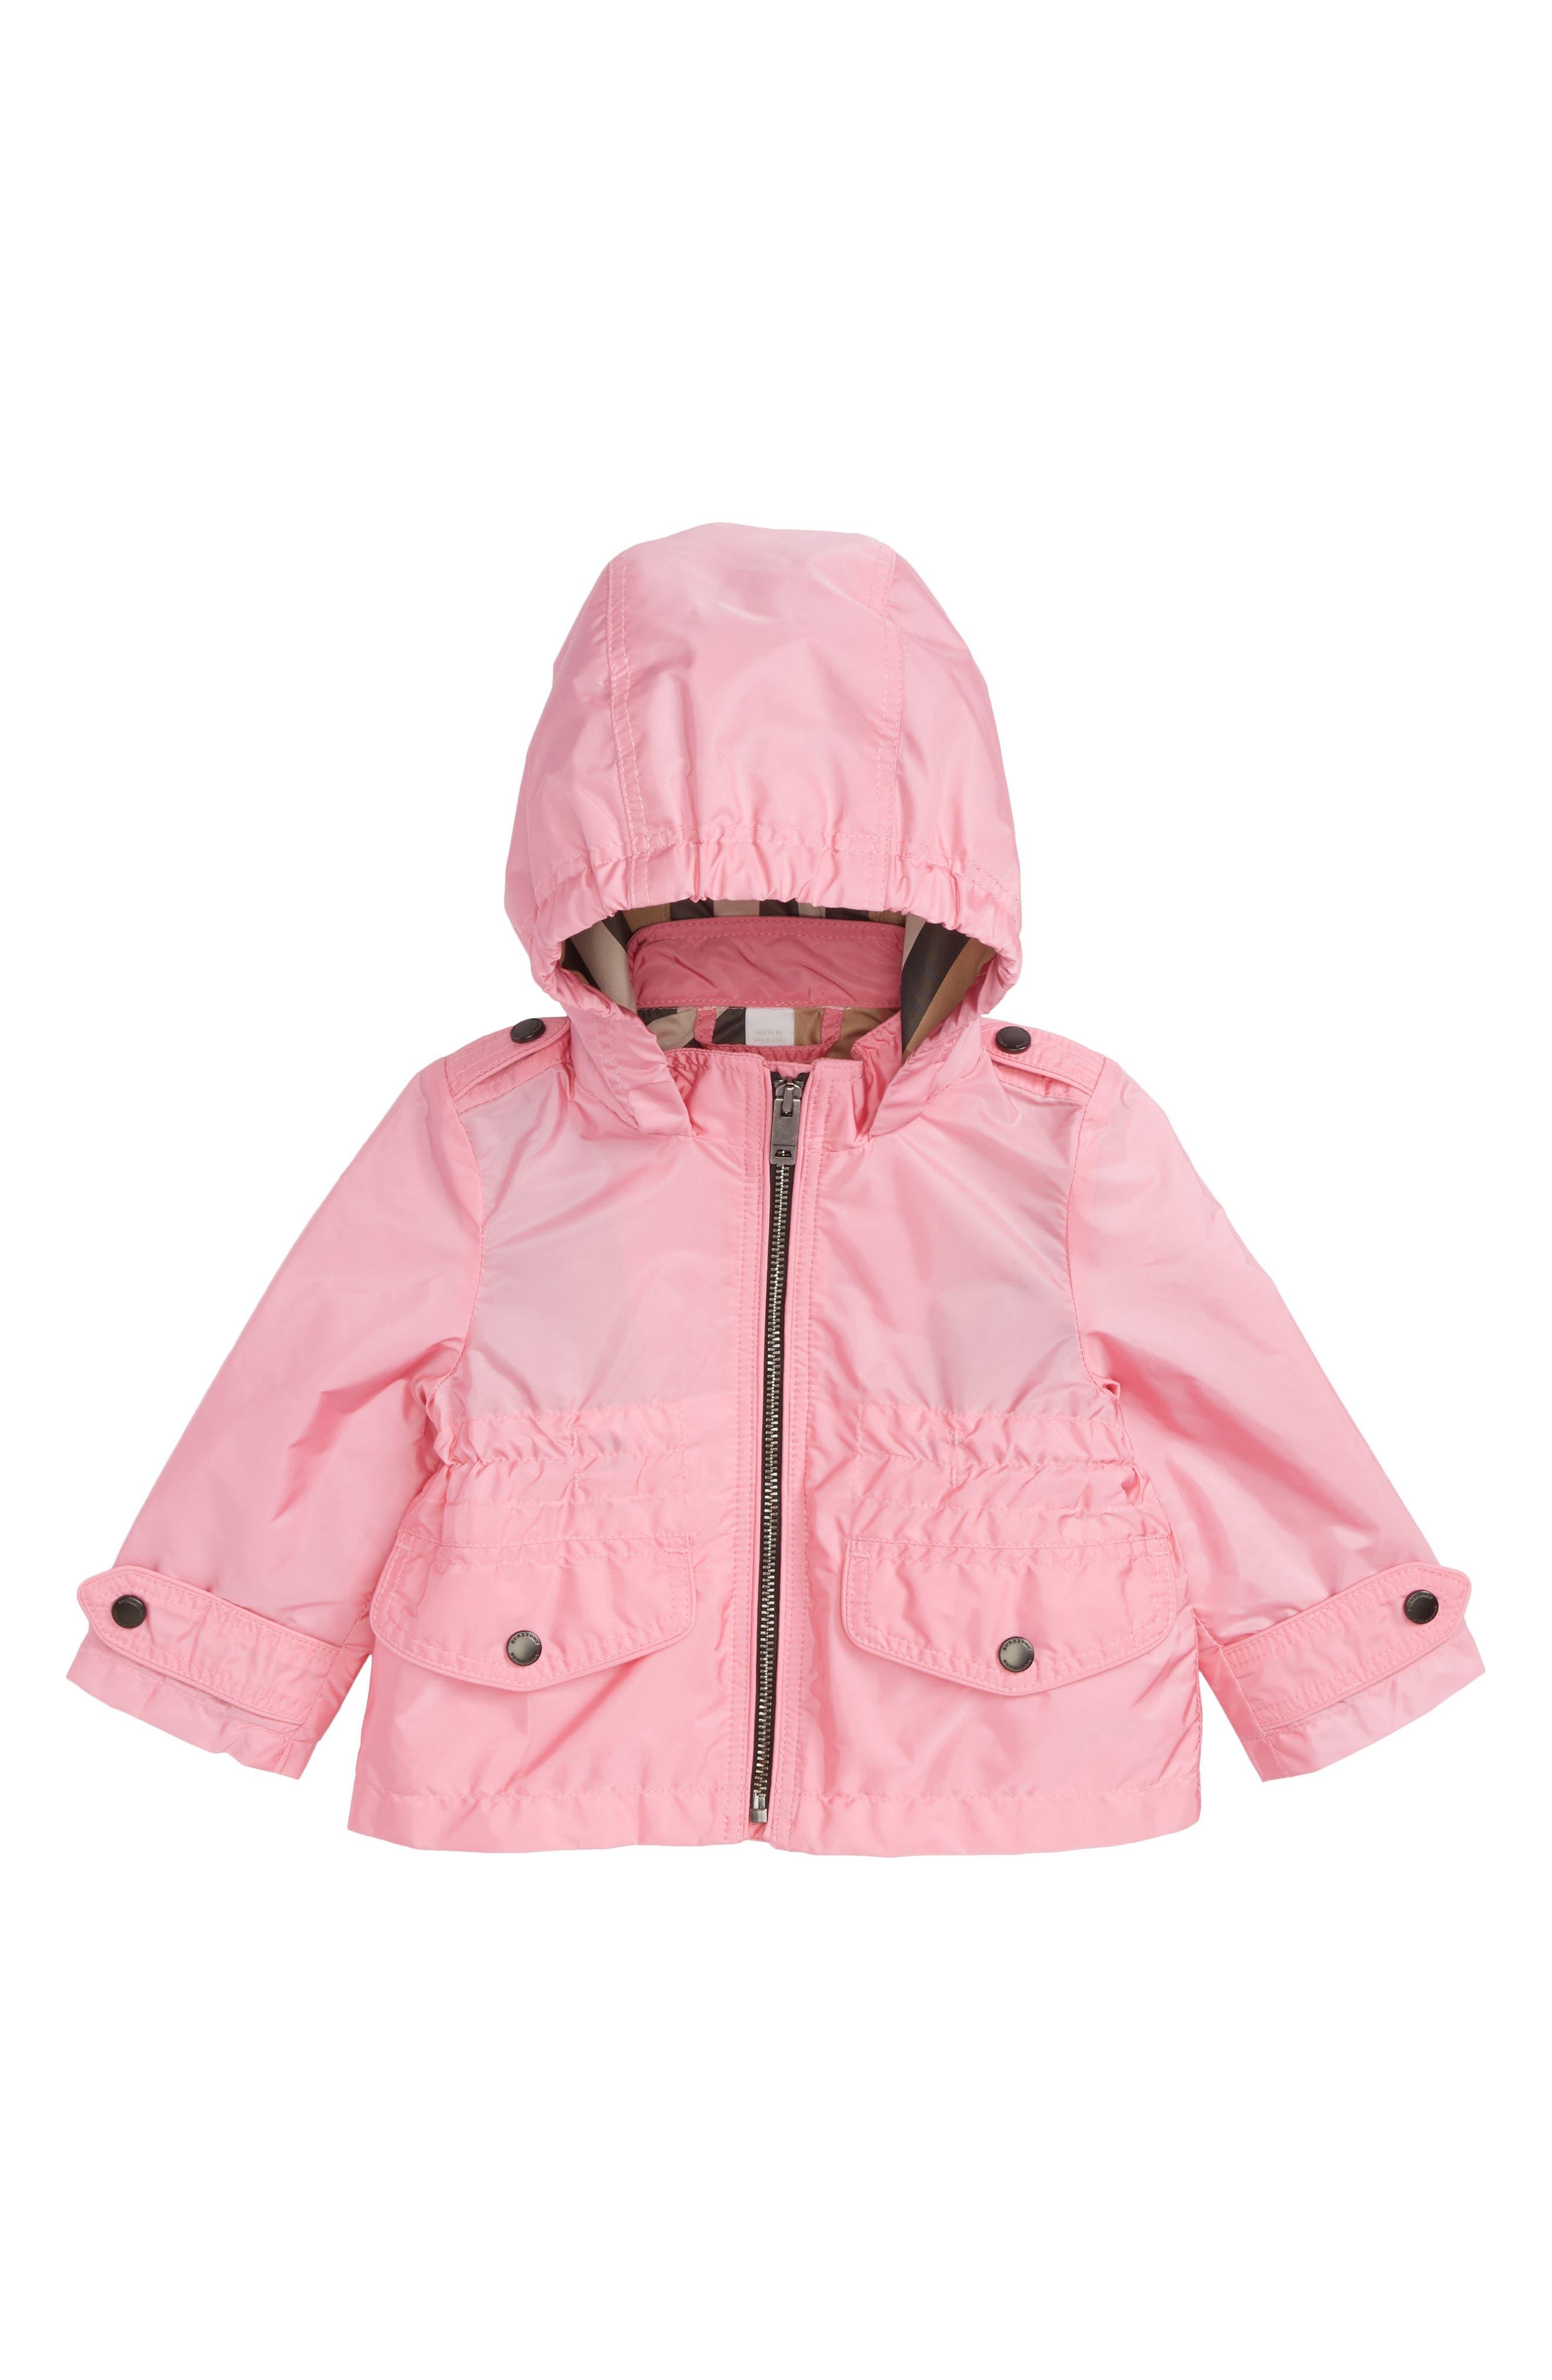 Mini Halle Hooded Packaway Rain Jacket,                             Main thumbnail 1, color,                             660